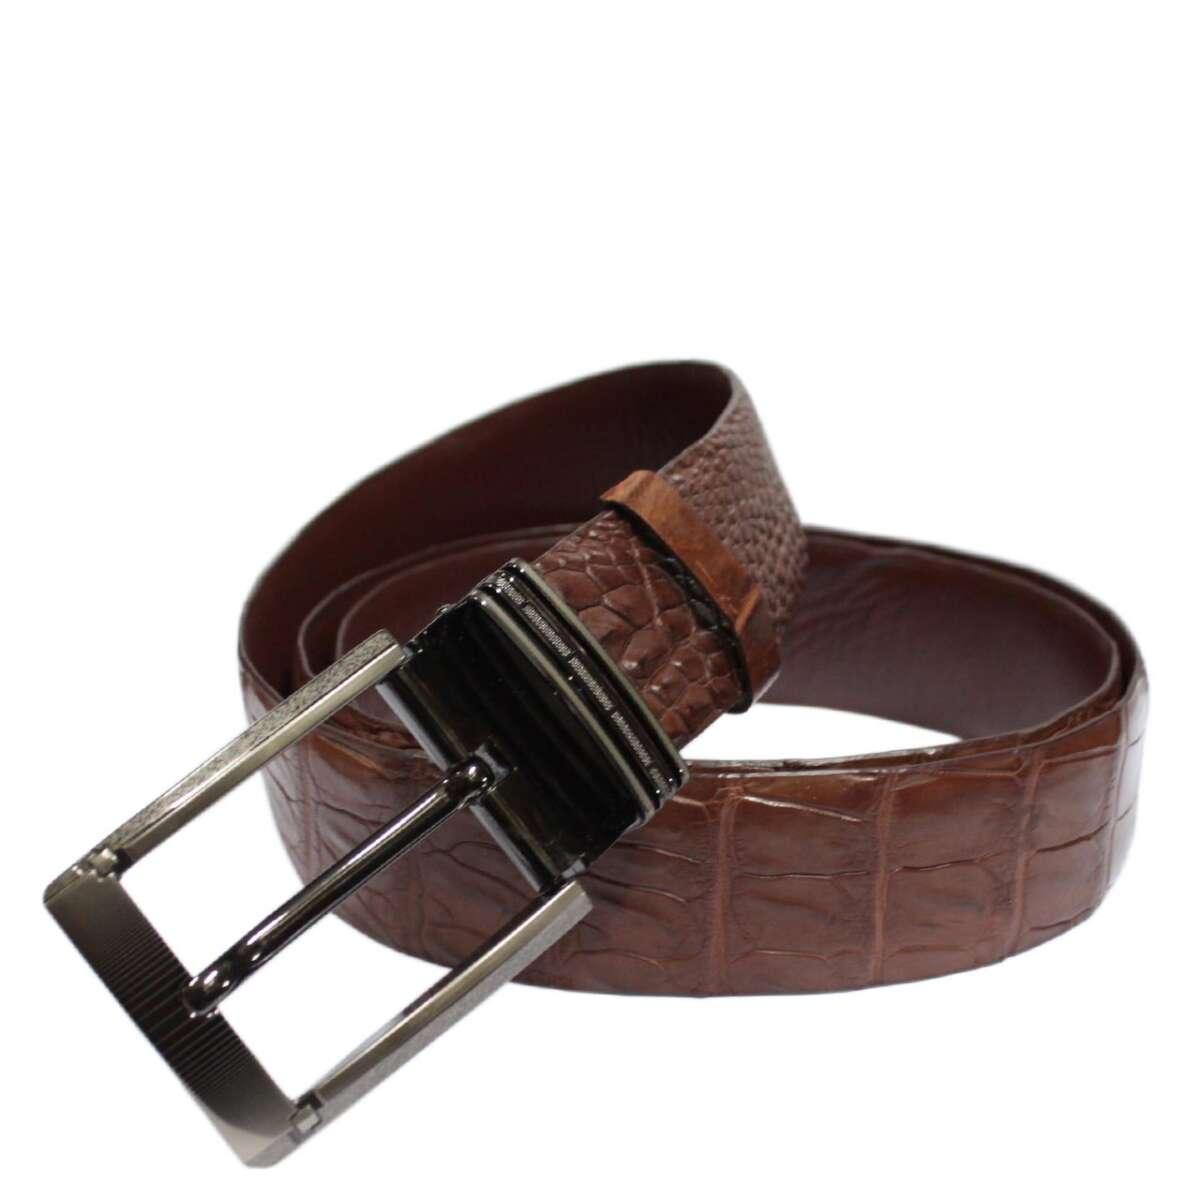 Men's crocodile leather belt S609a